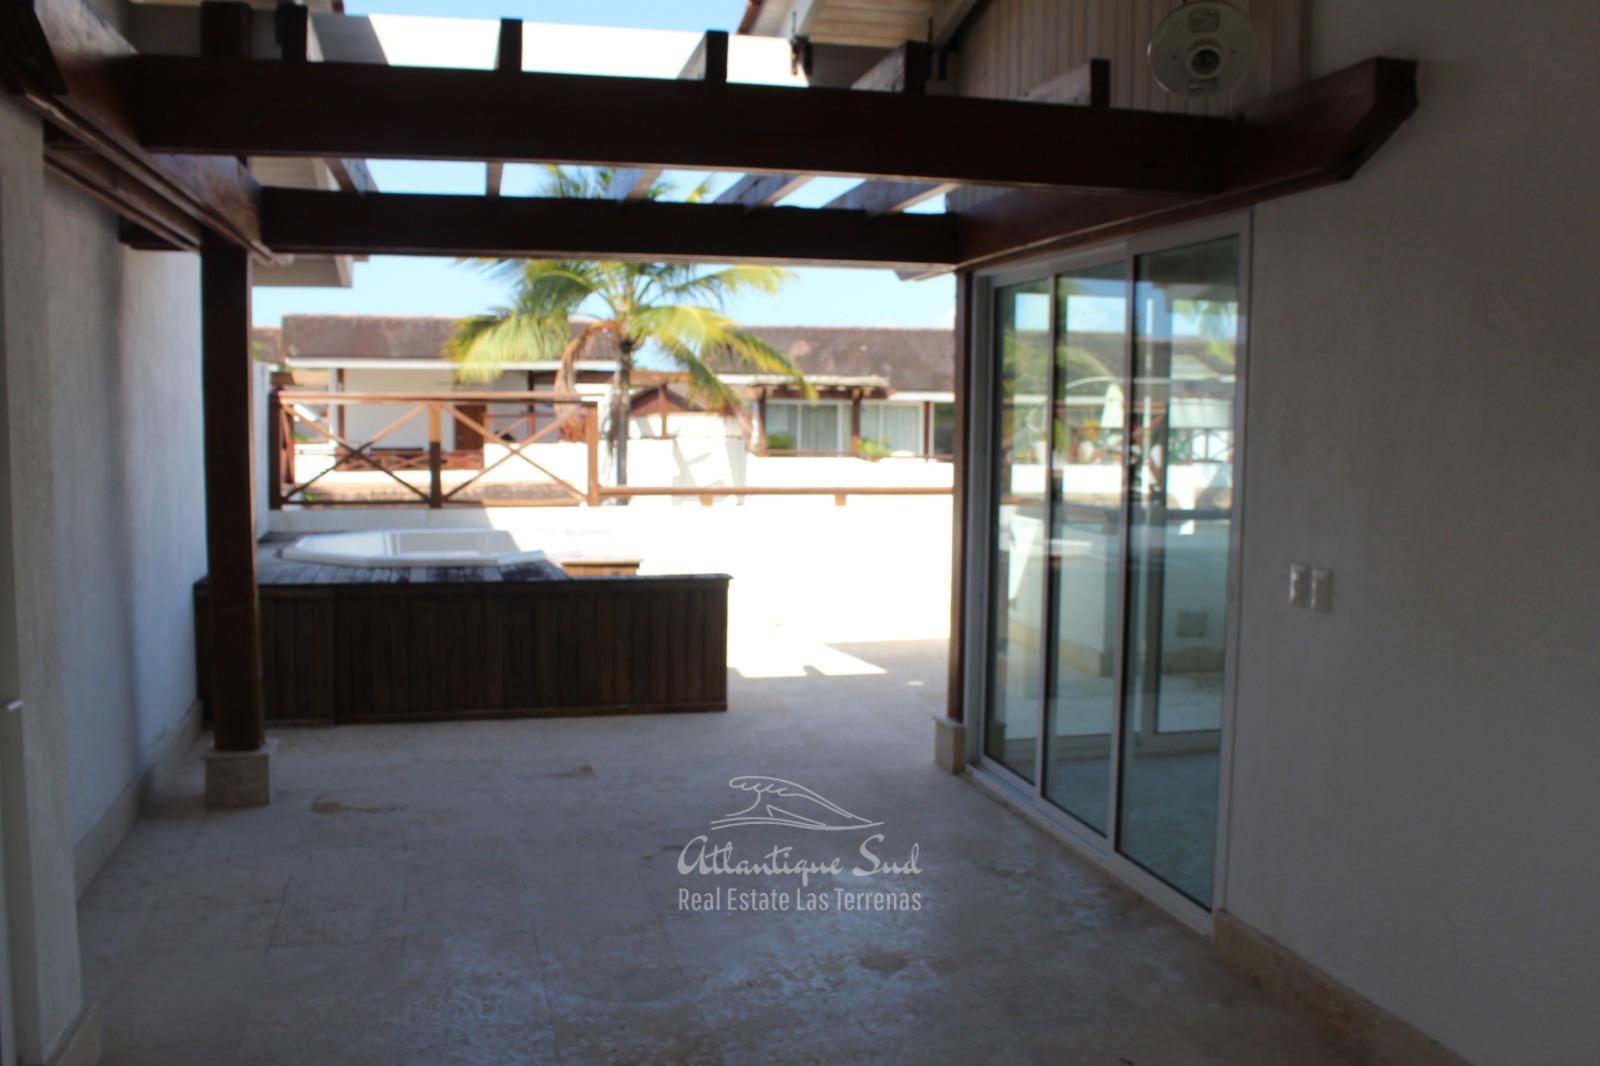 Apartments near the beach real estate las terrenas dominican republic 31 (9).jpg